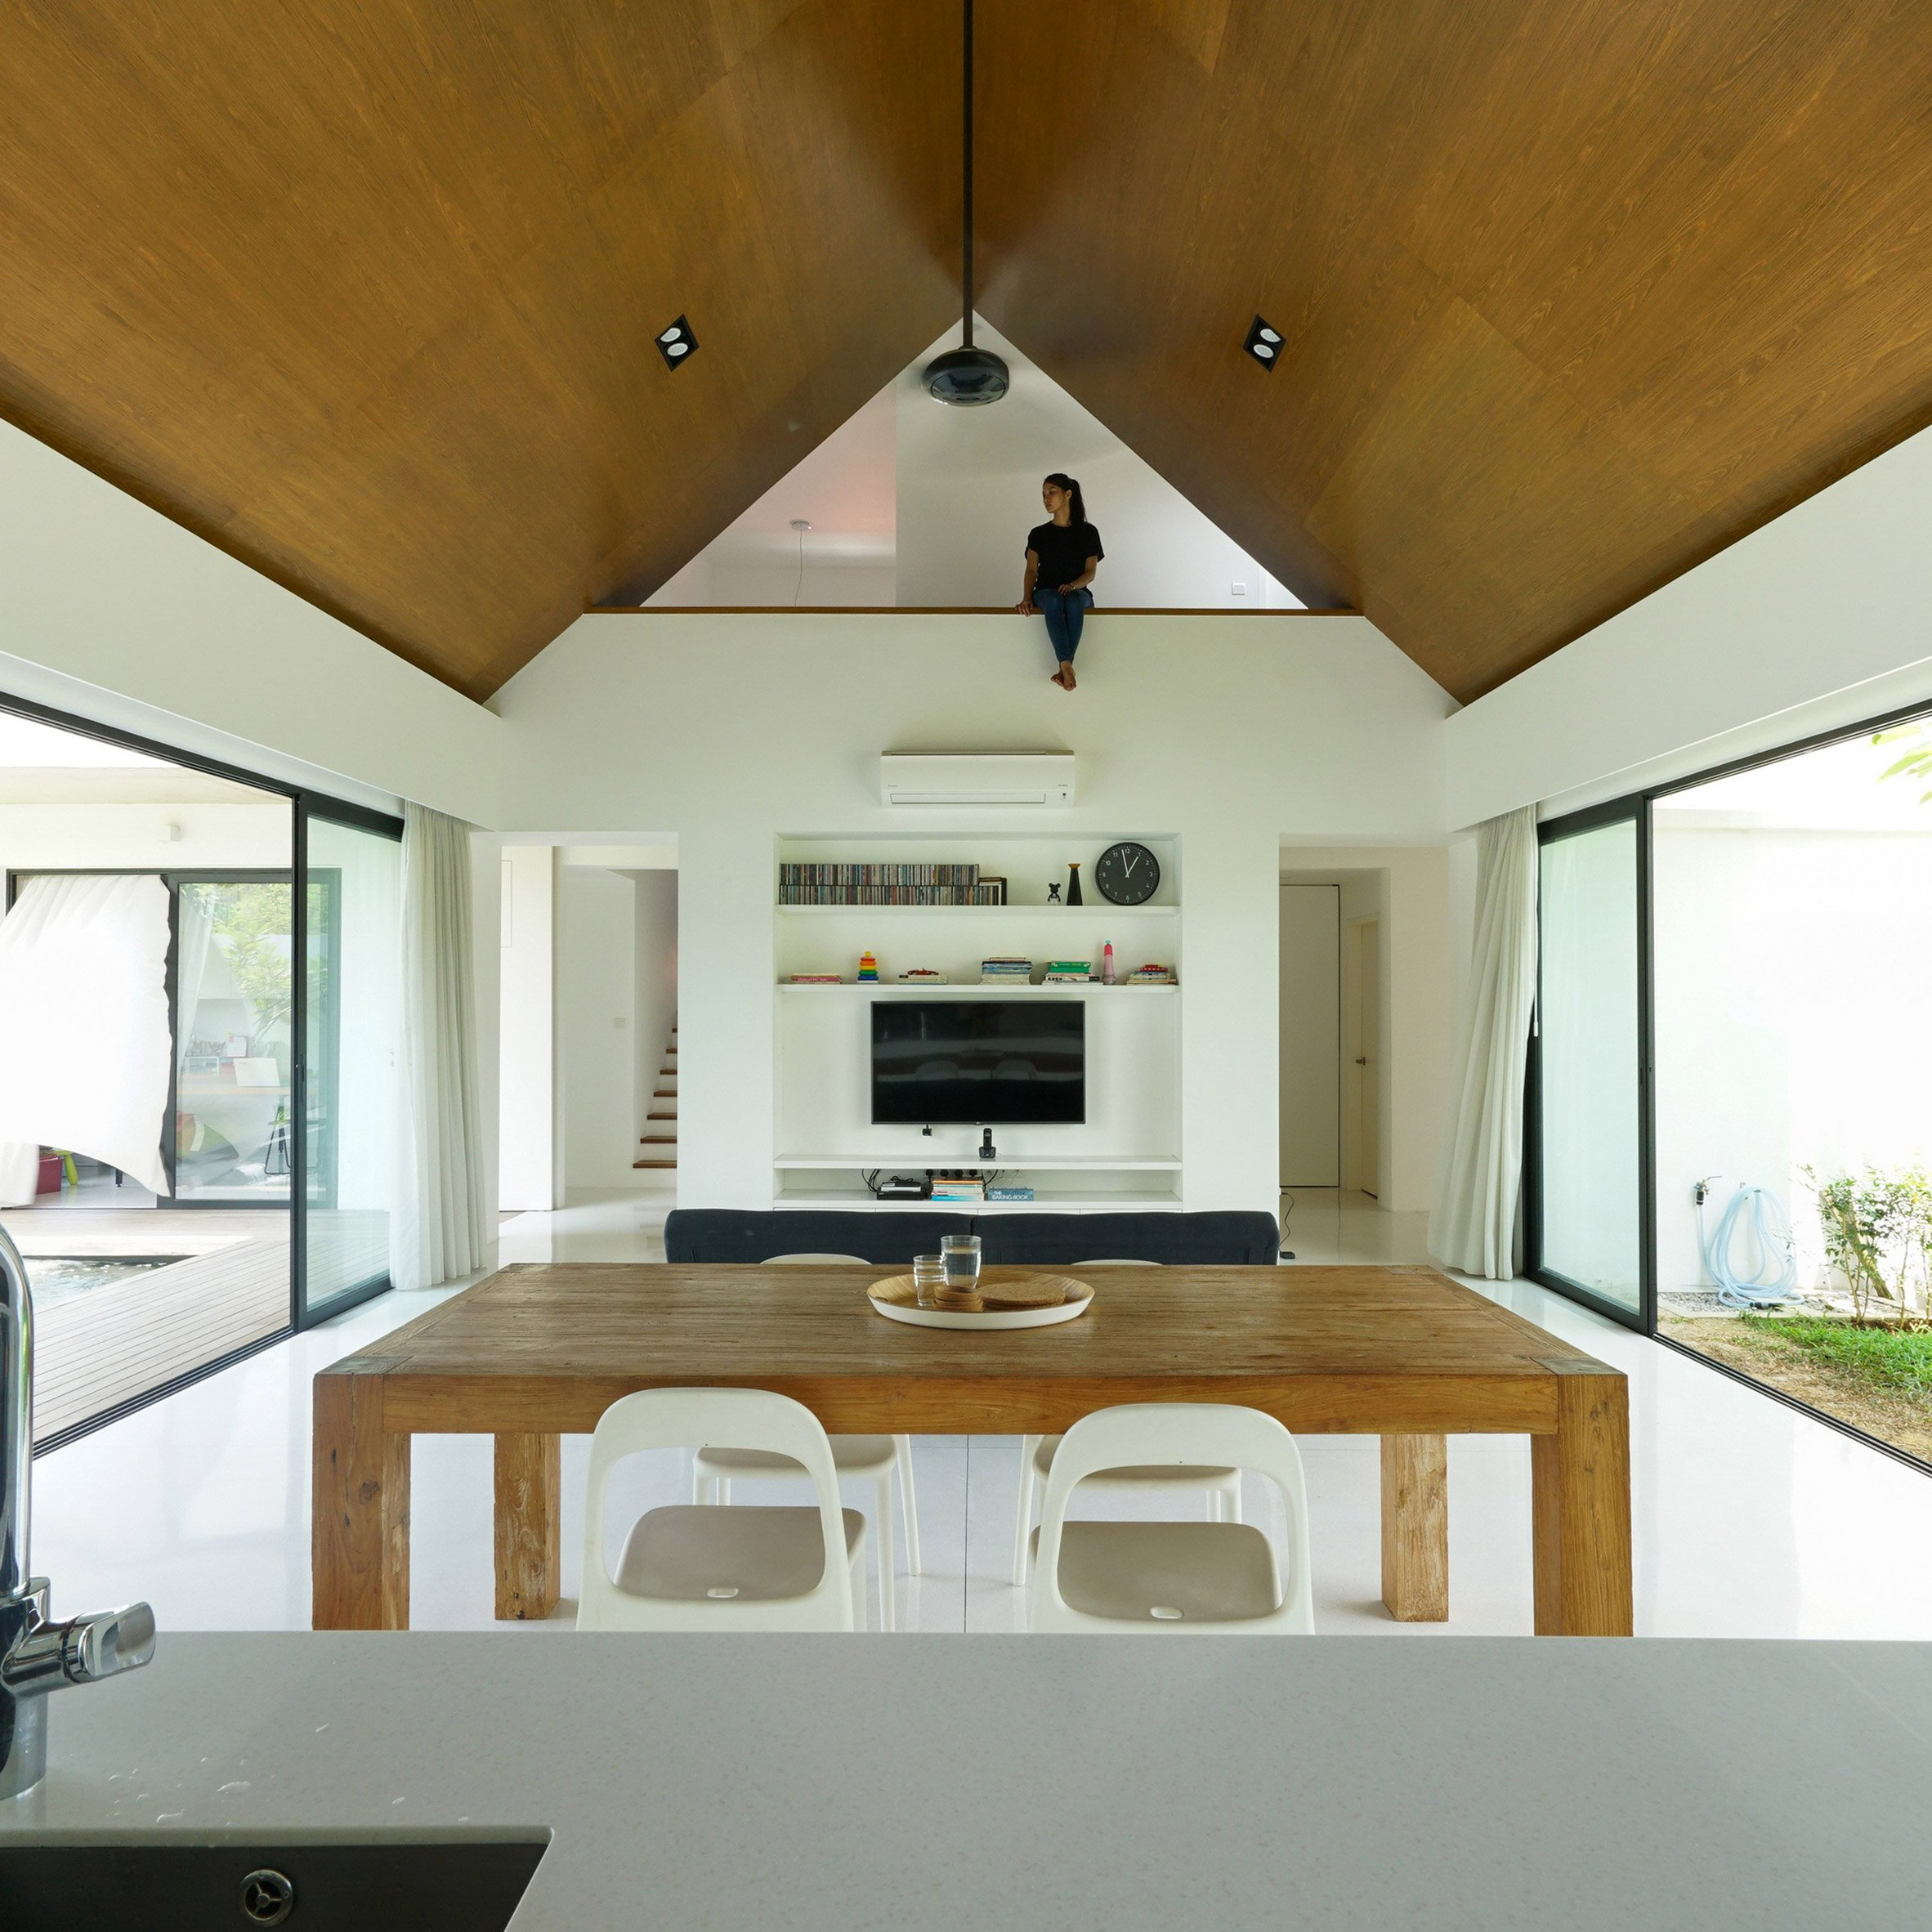 House design and architecture | Dezeen